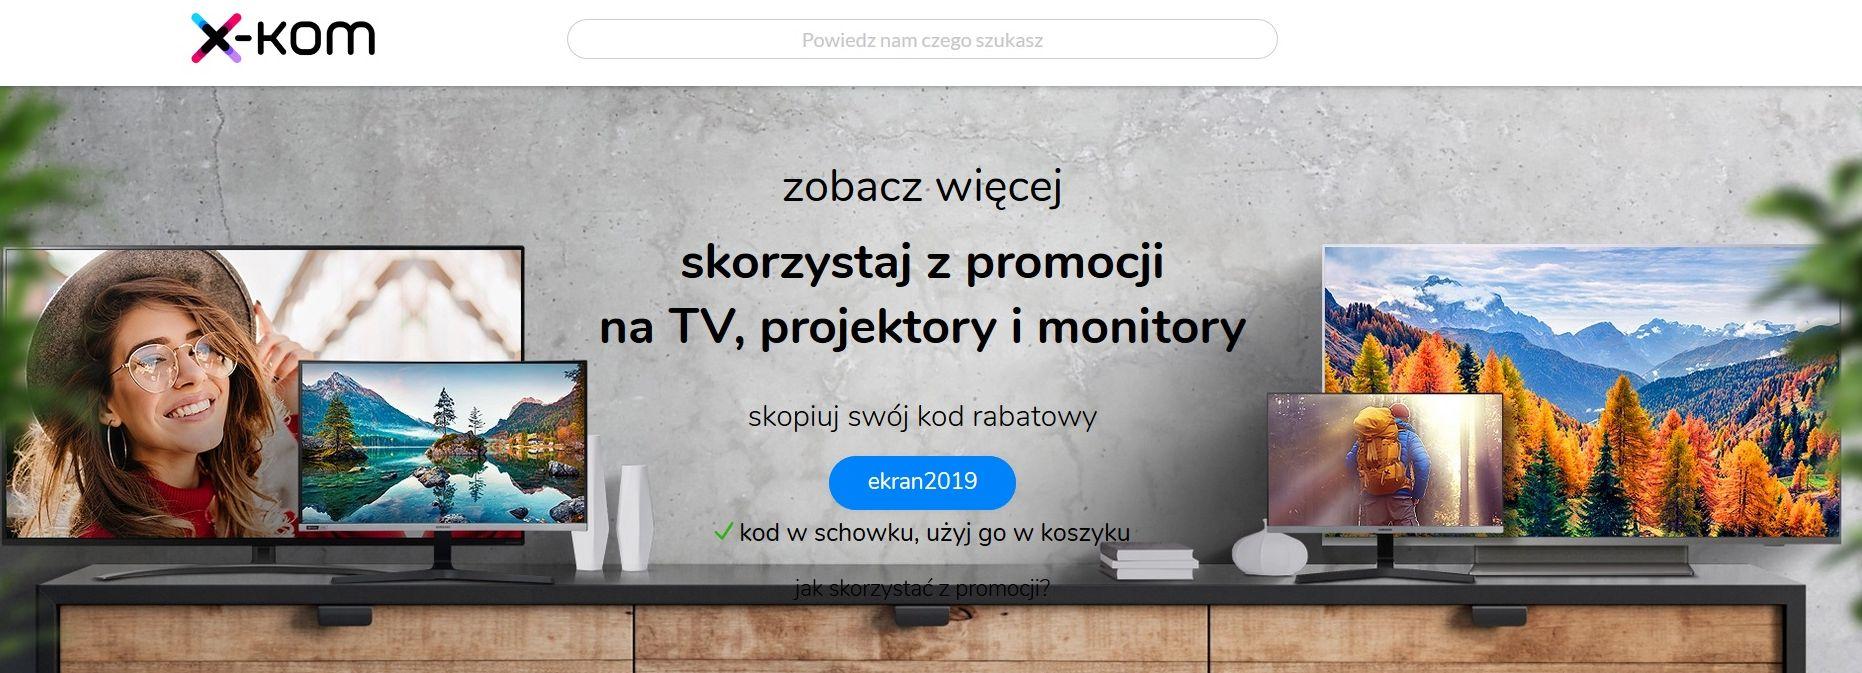 X-kom: promocje na telewizory